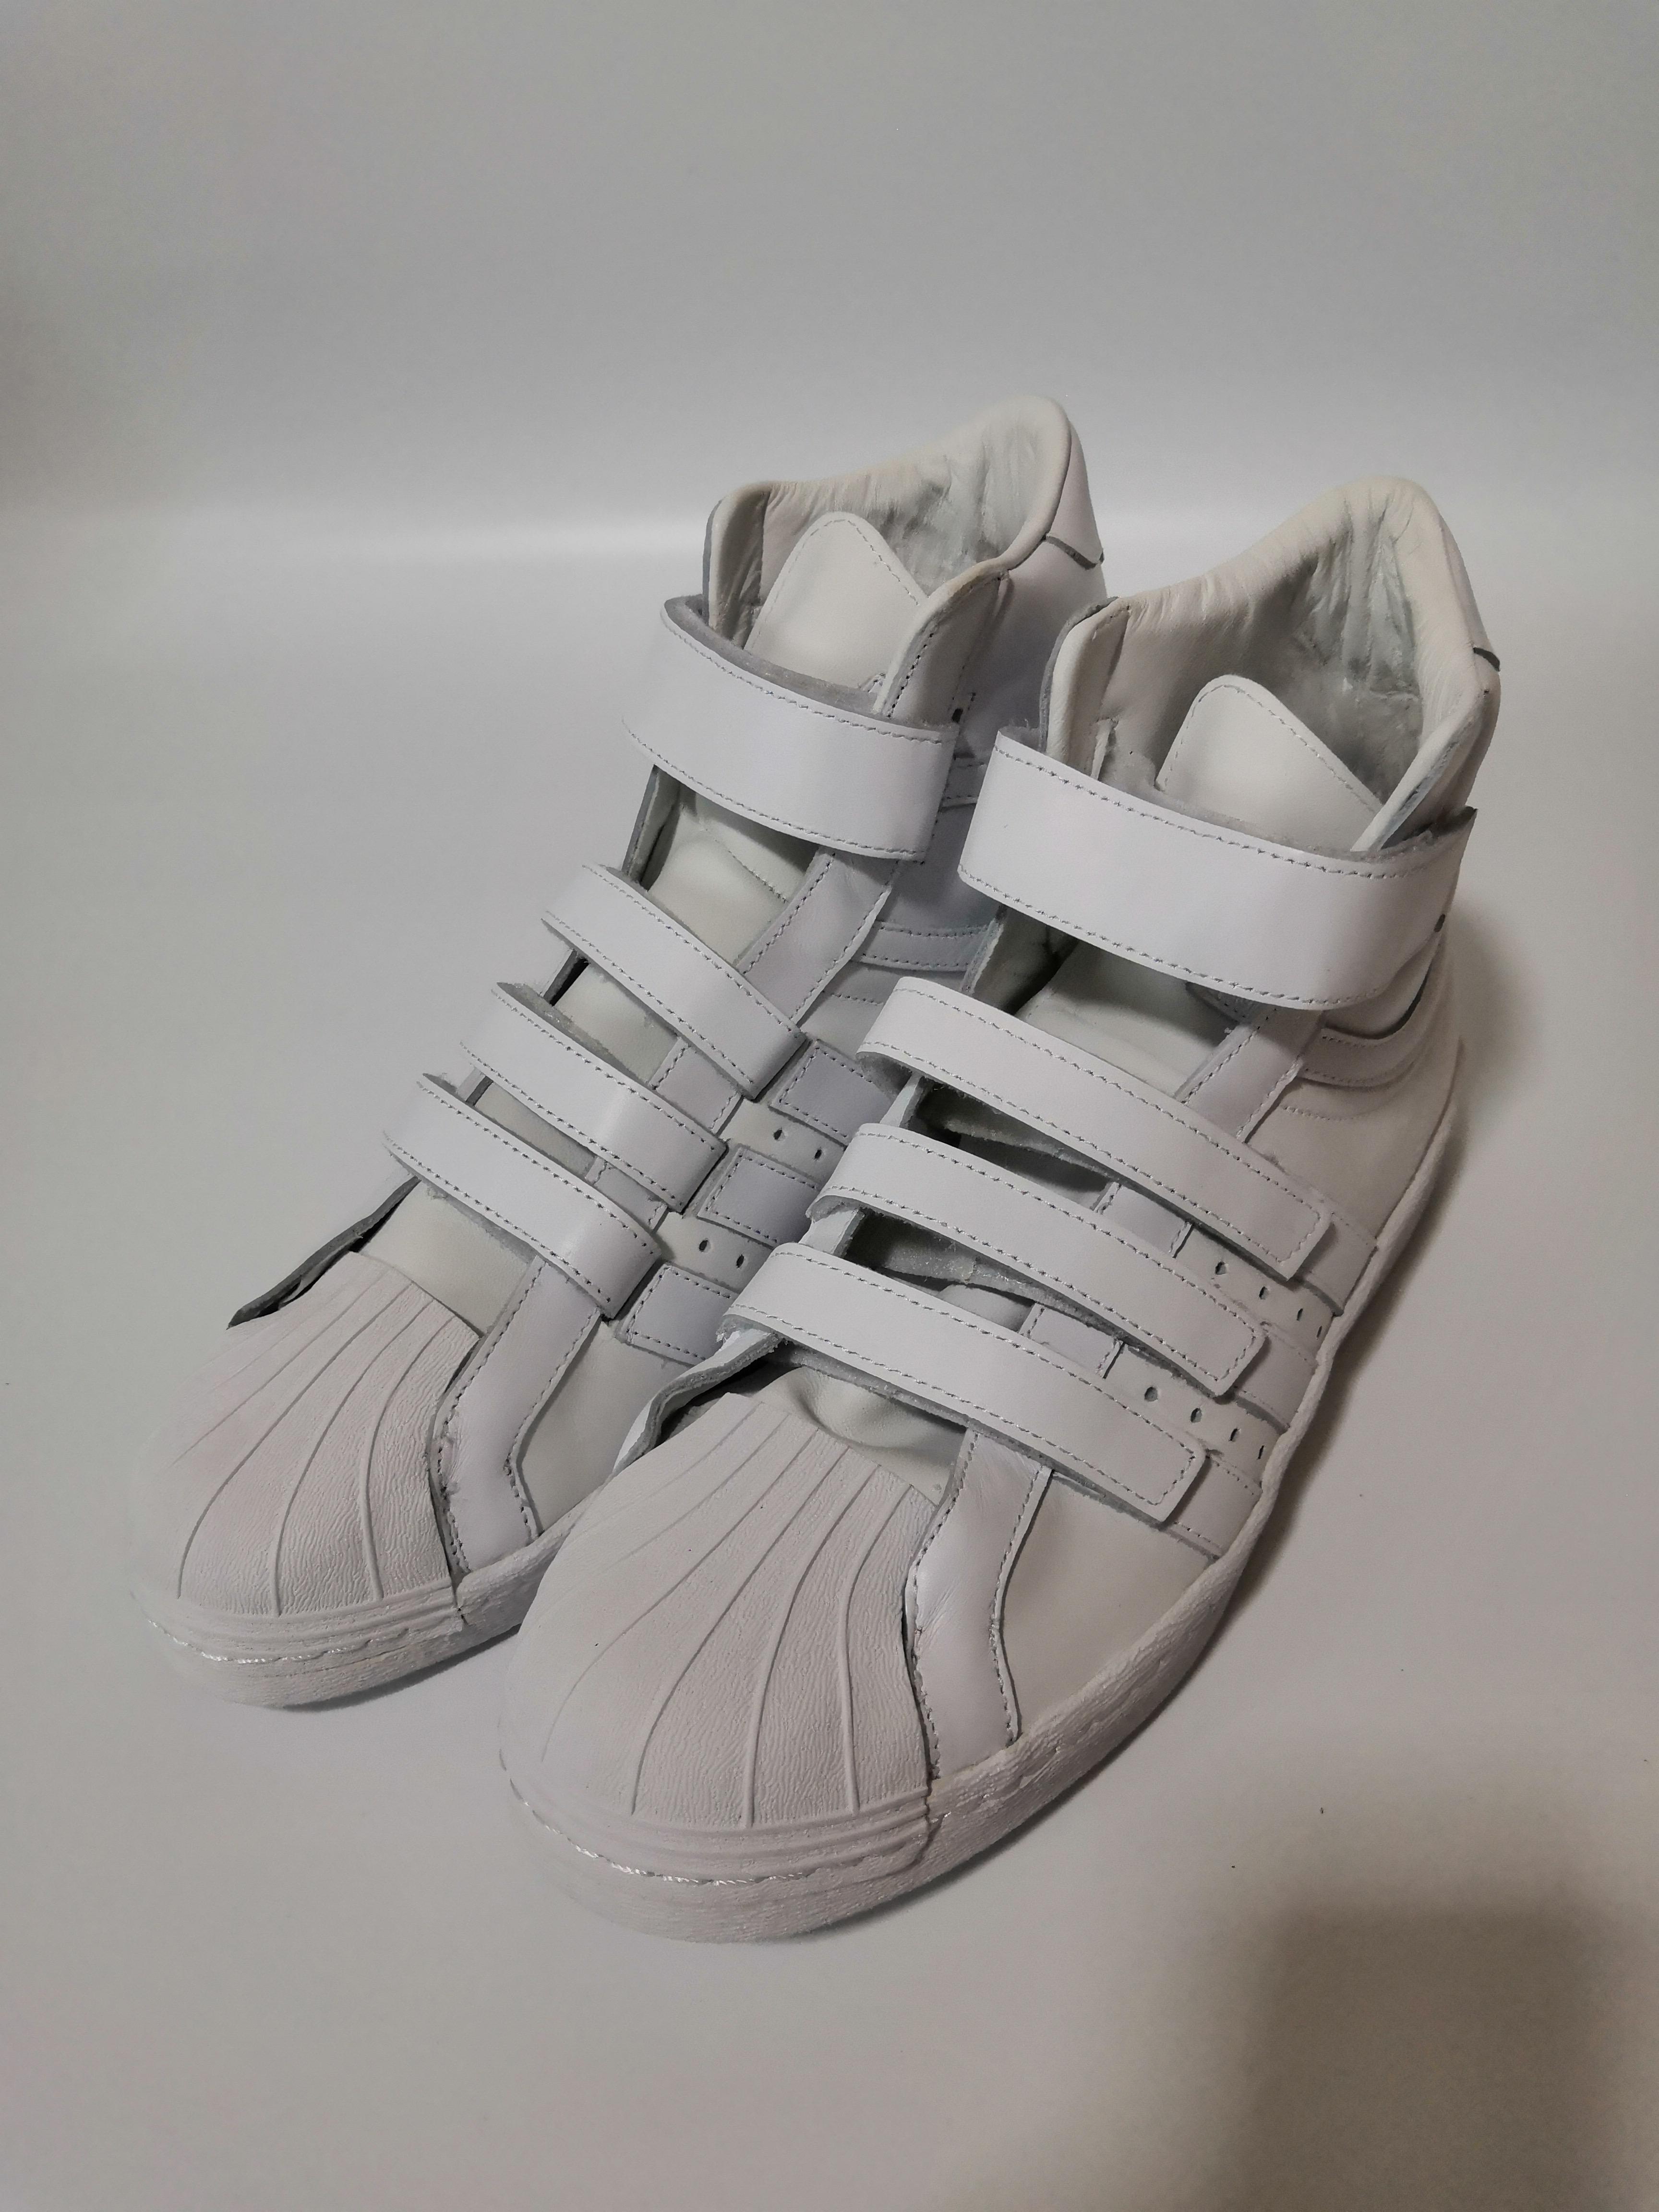 premium selection c4c68 bfadc adidas x Juun J Superstar 80s Trainers US10